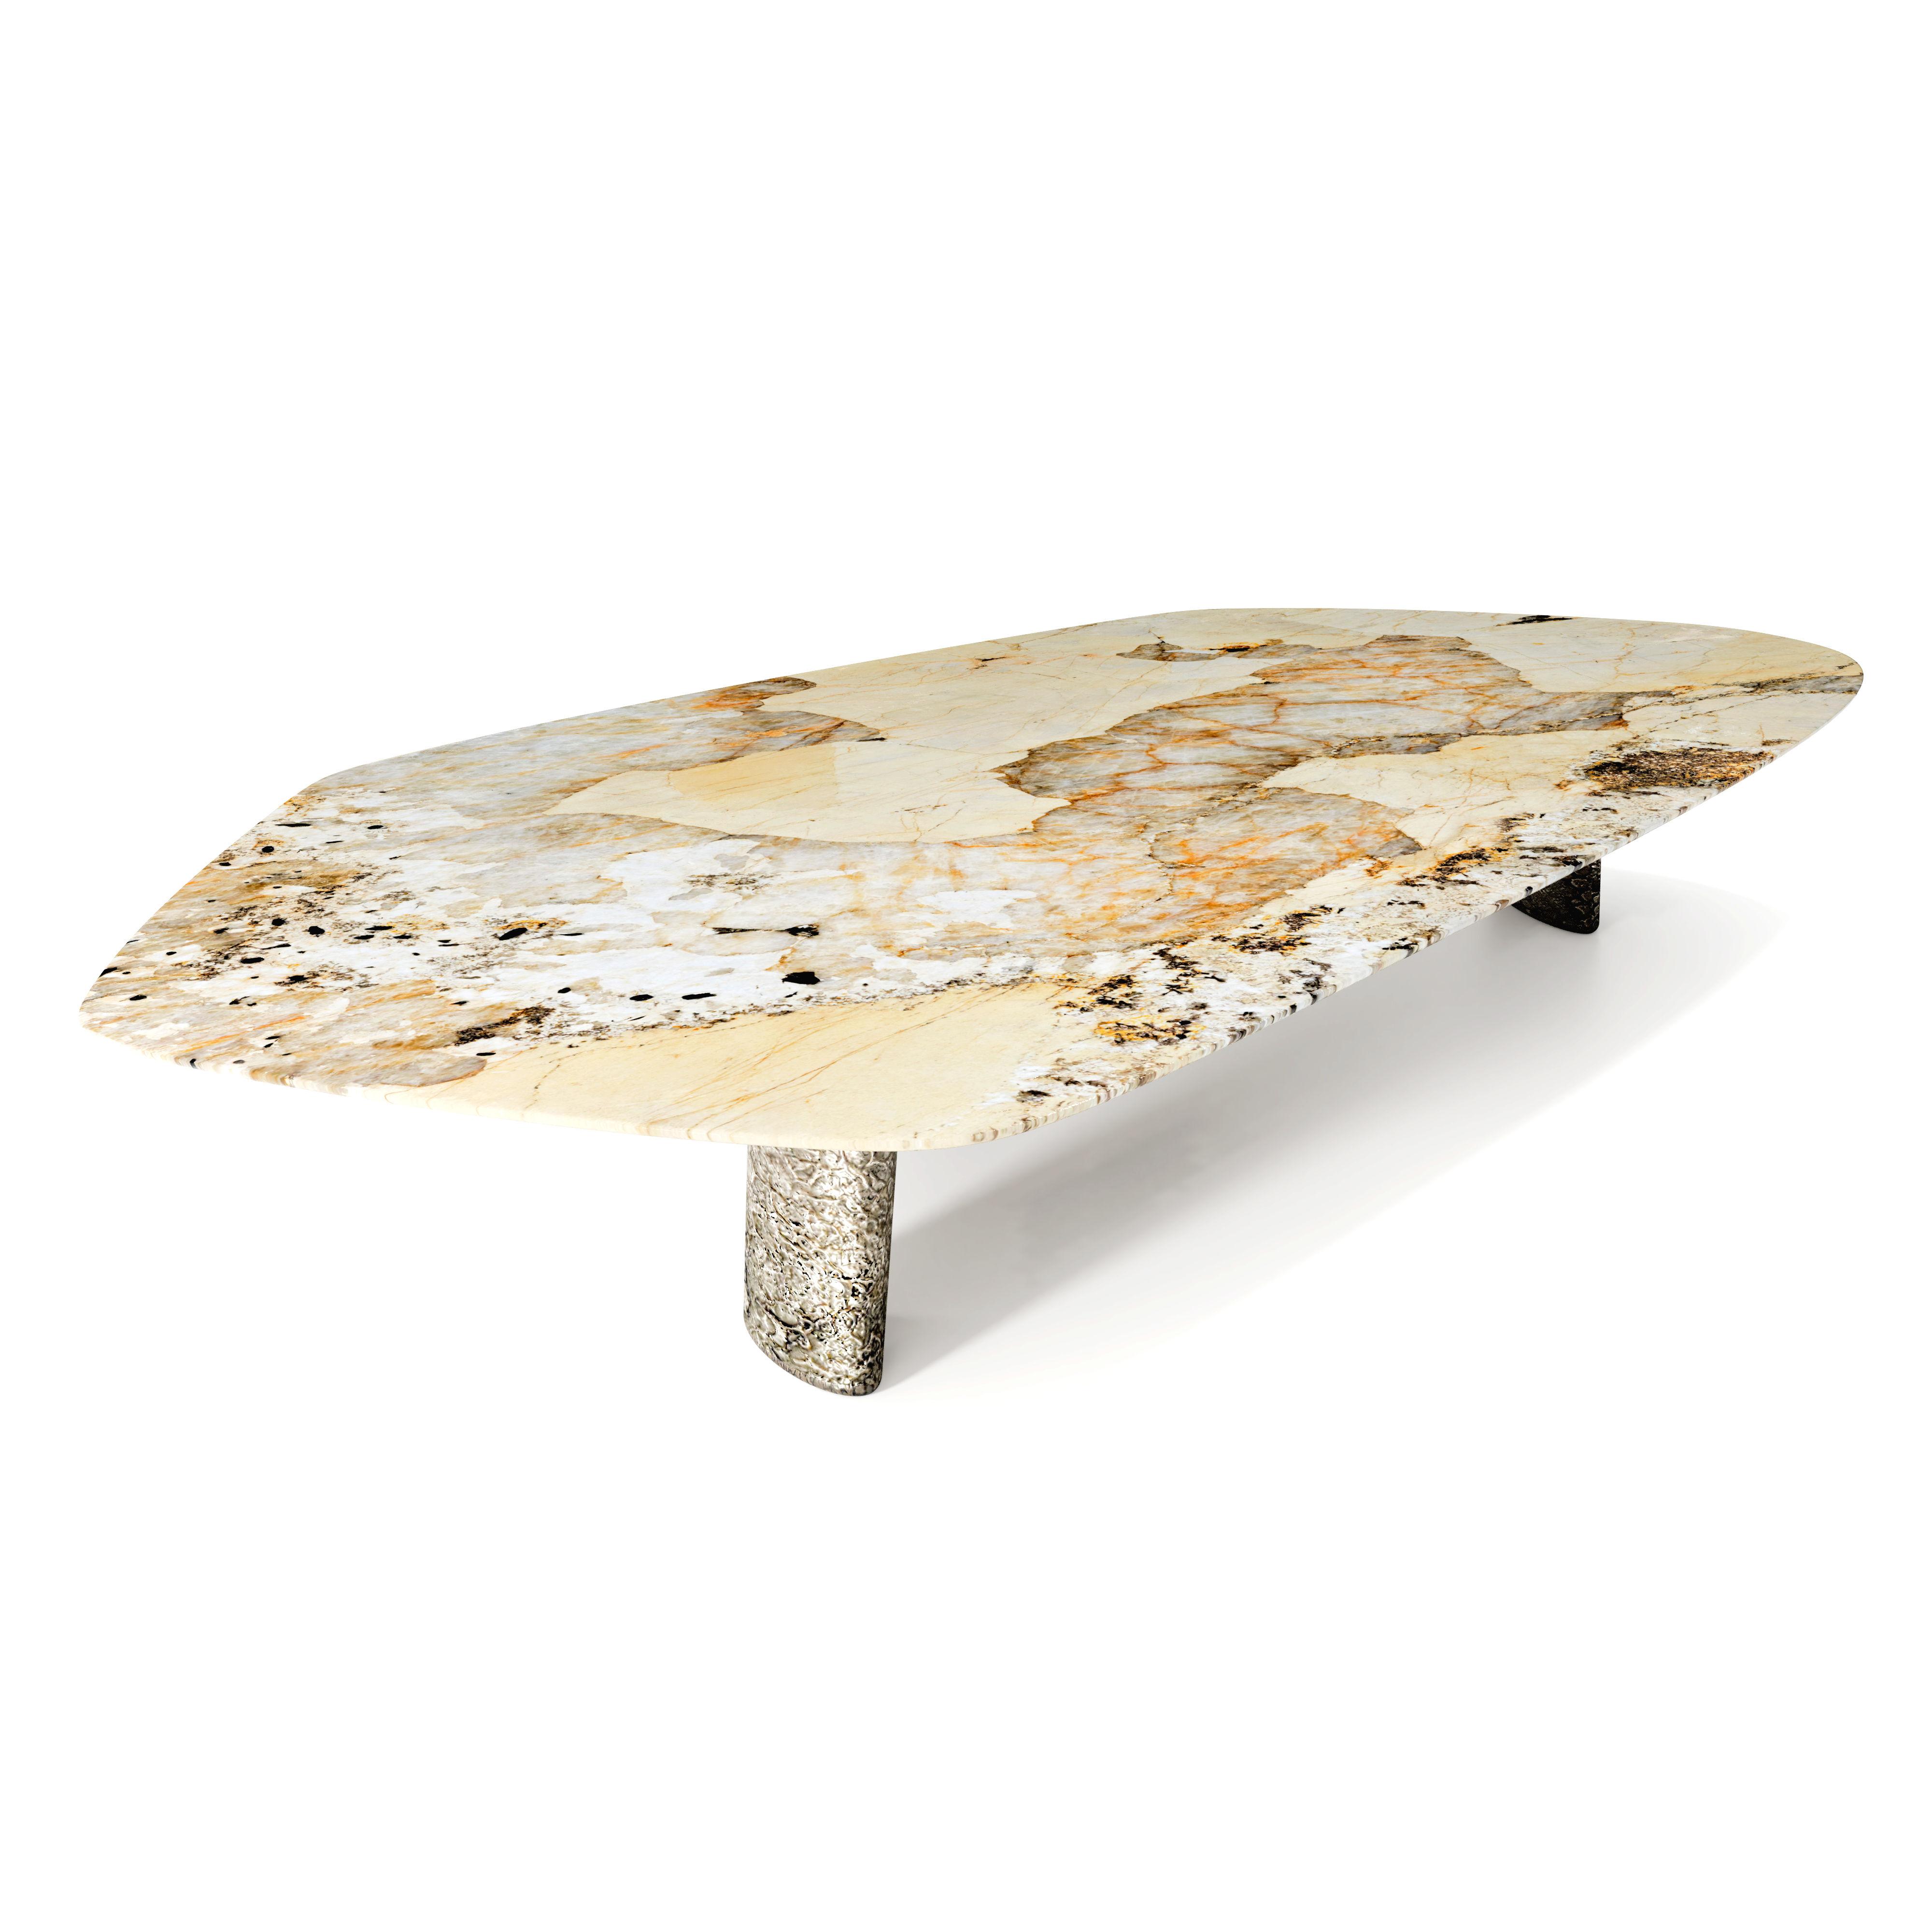 The Elements Modern Center Table By Grzegorz Majka 2020 Visualartwork The Artling